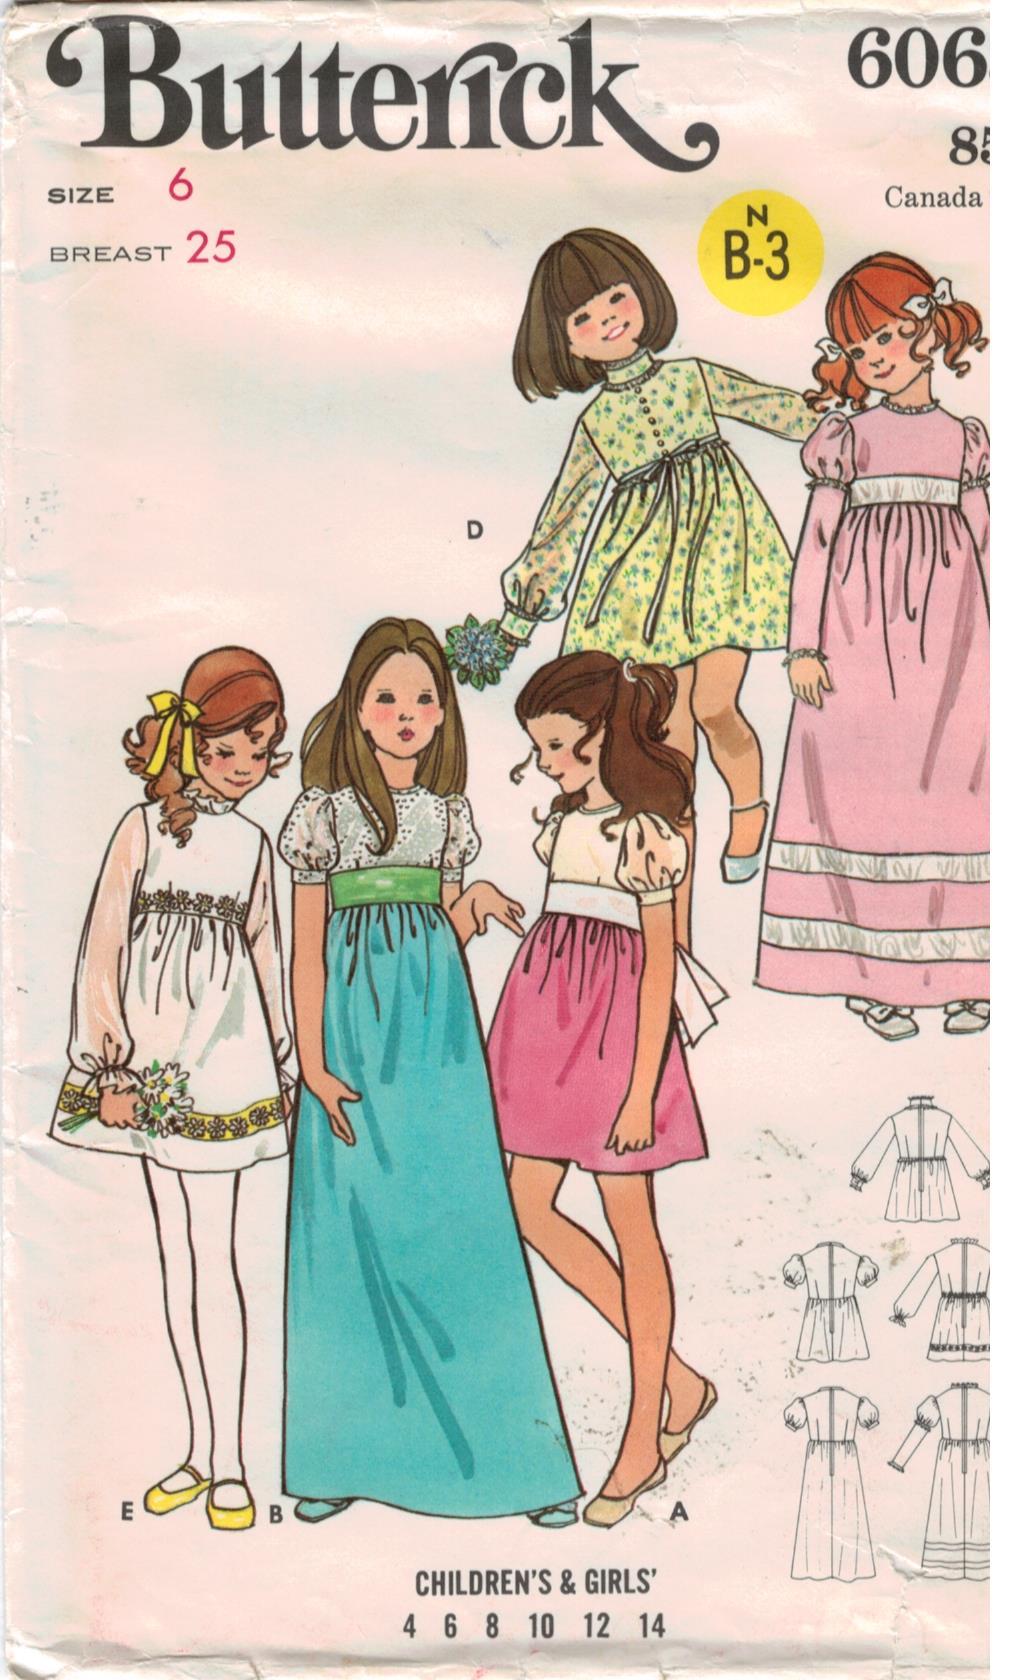 Butterick Pattern for Children